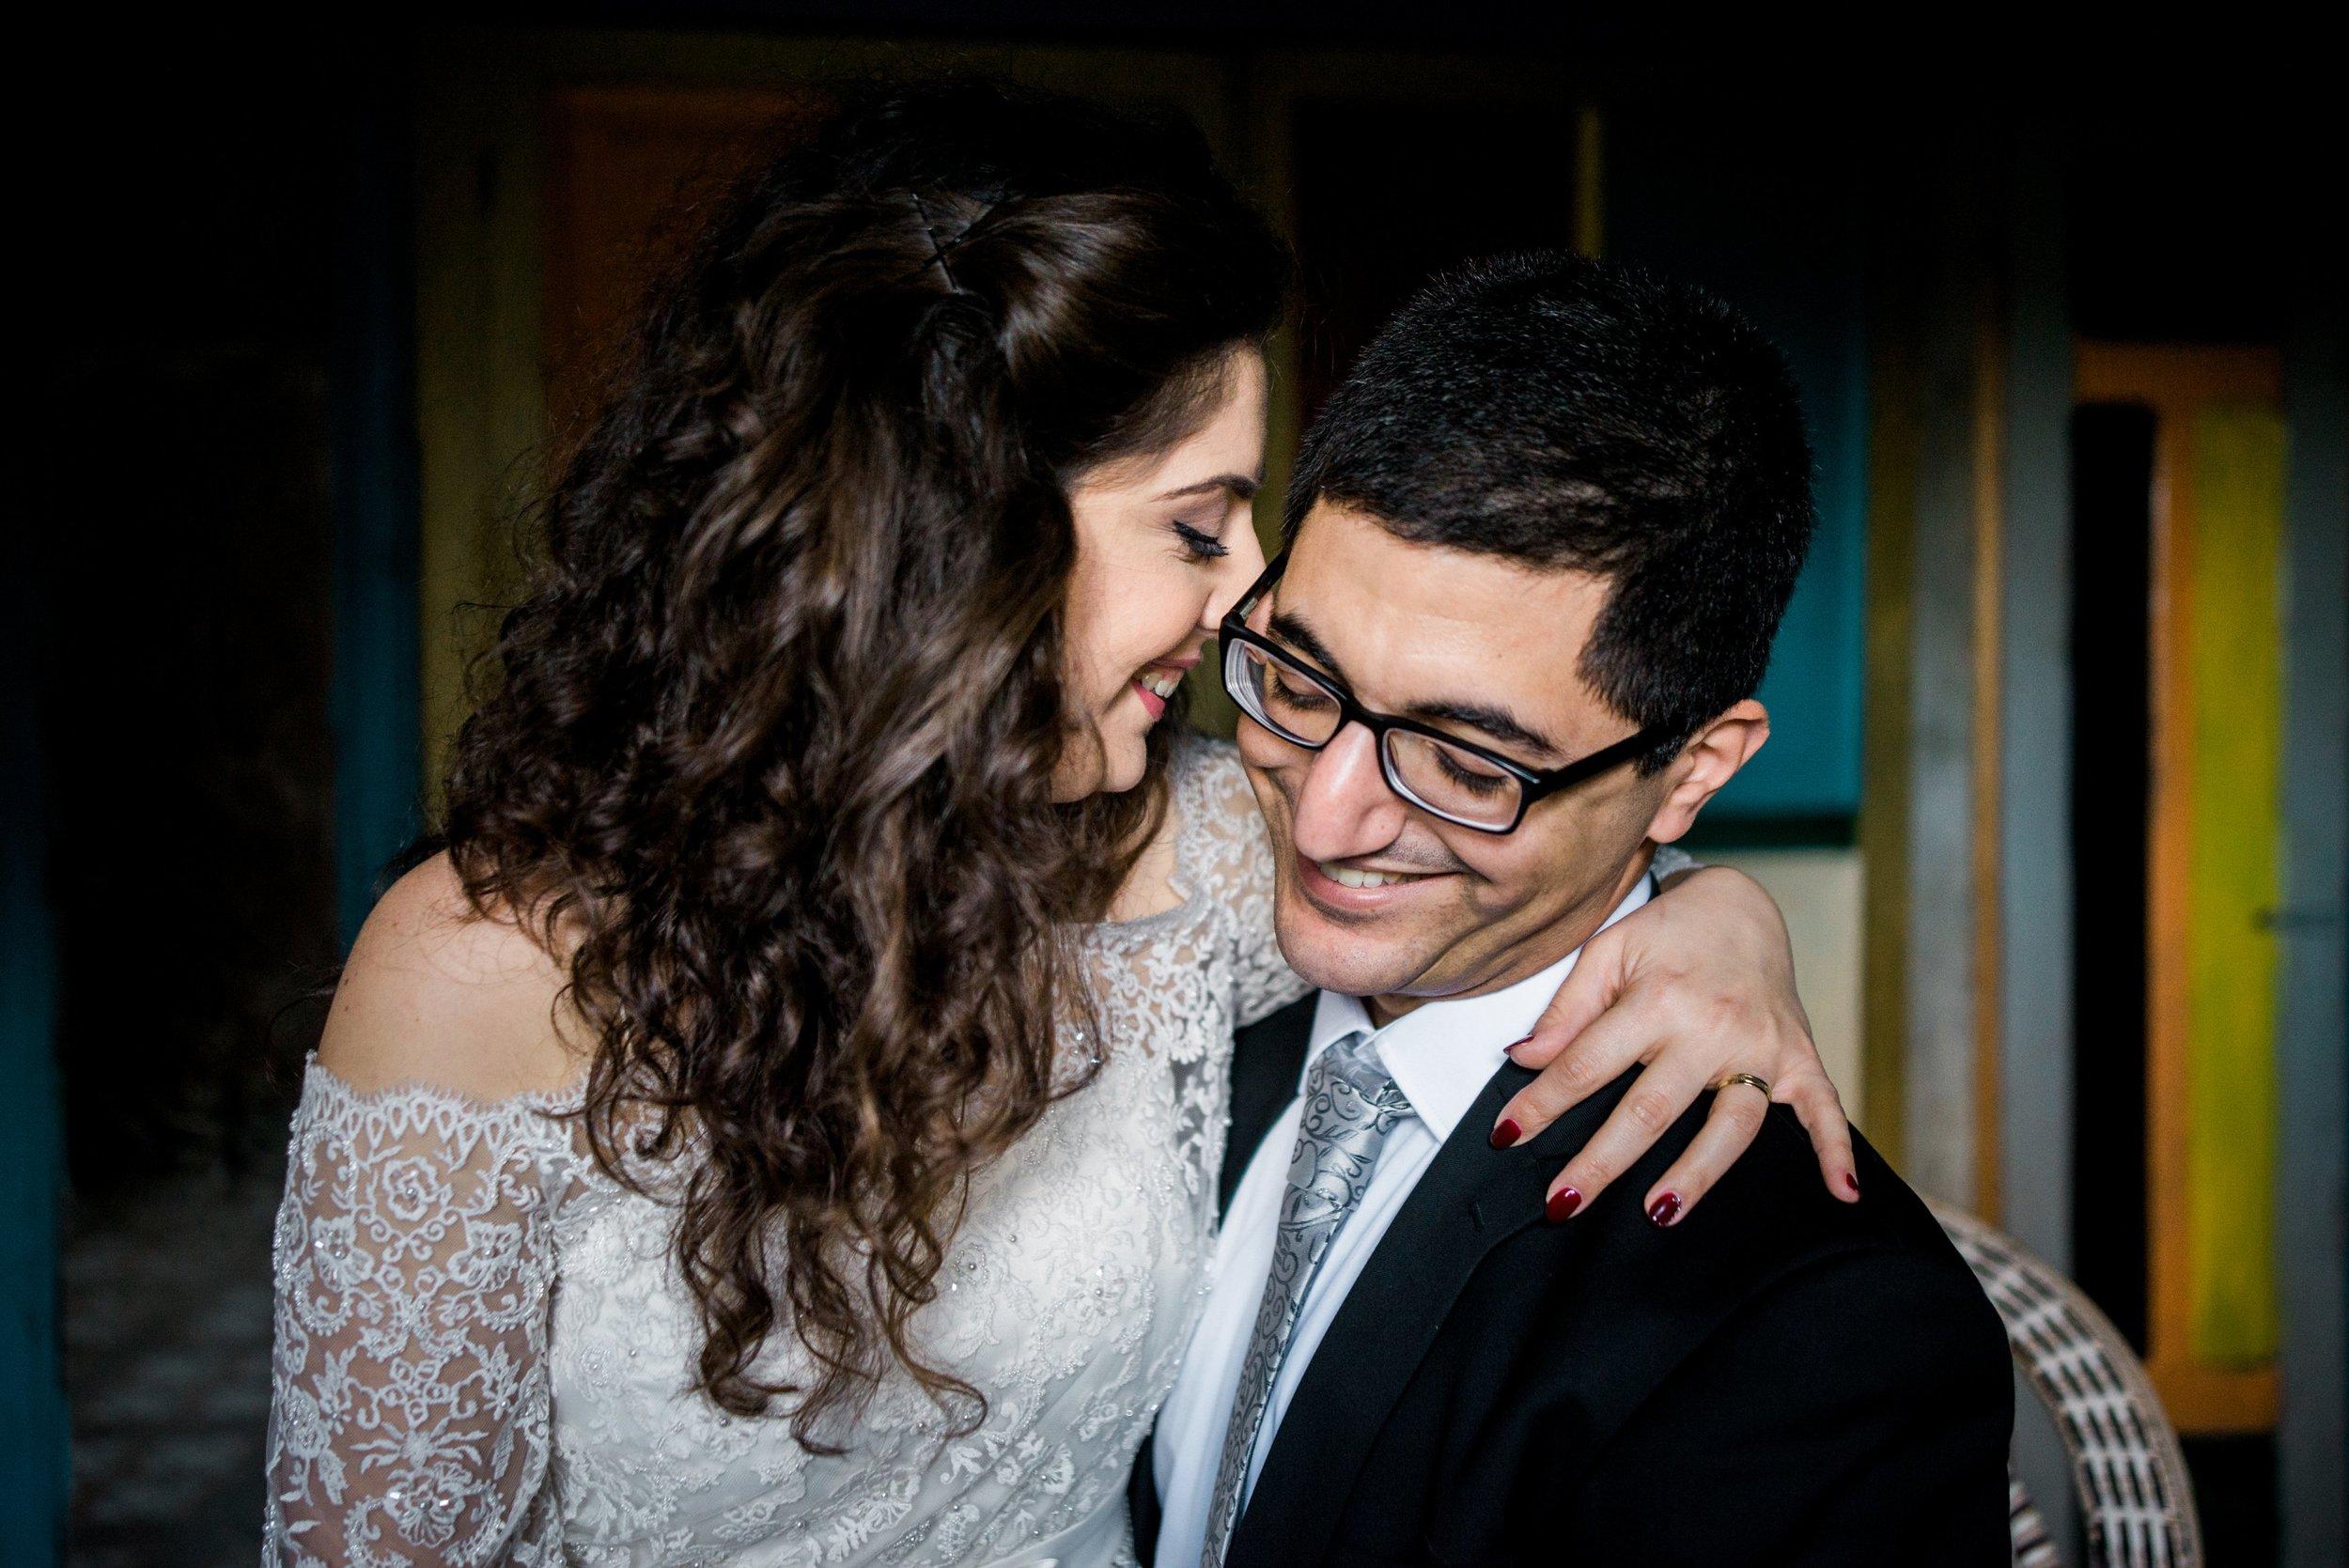 israel-garden-wedding-portraits-session-kate-giryes-photography--51_WEB.jpg